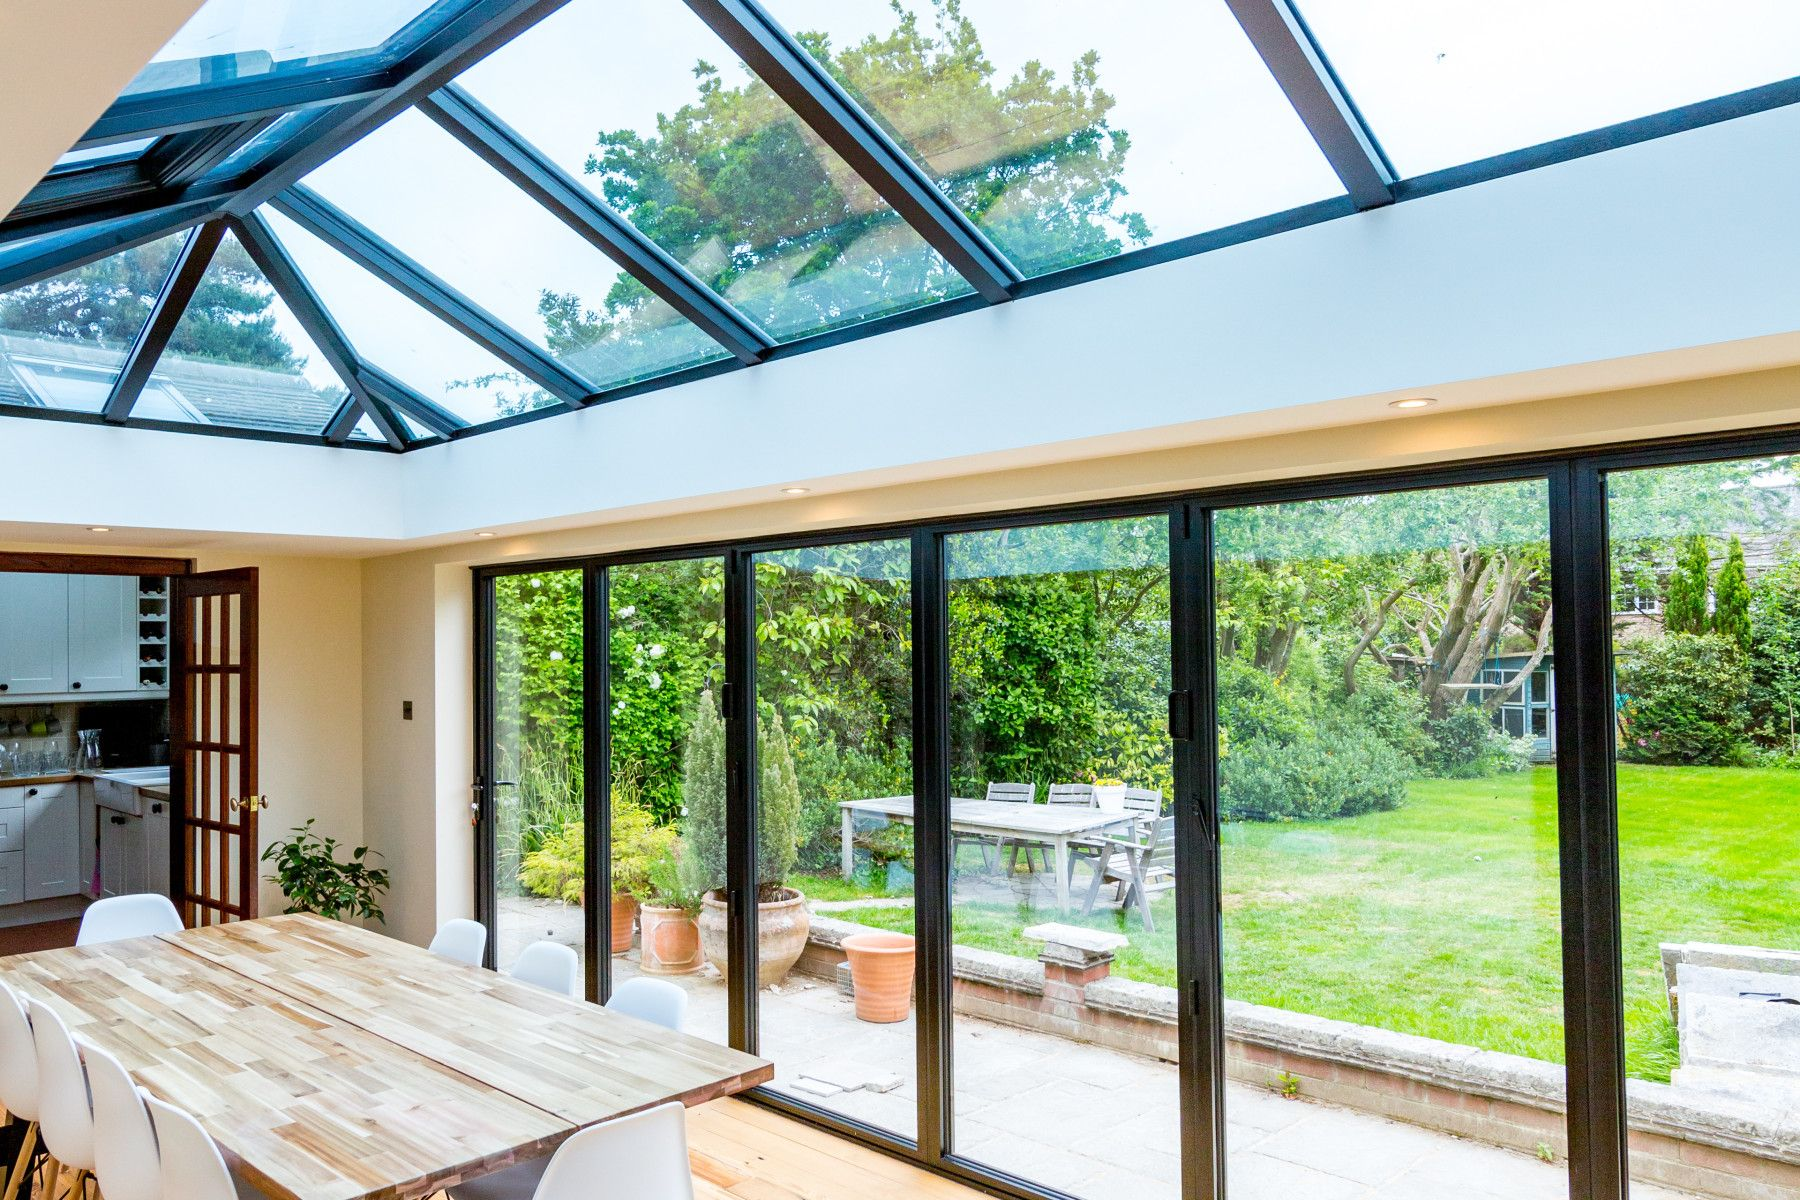 Ultrasky Roof Orangery Roof Online Orangery Roof Prices Orangery Roof Conservatory Roof Orangery